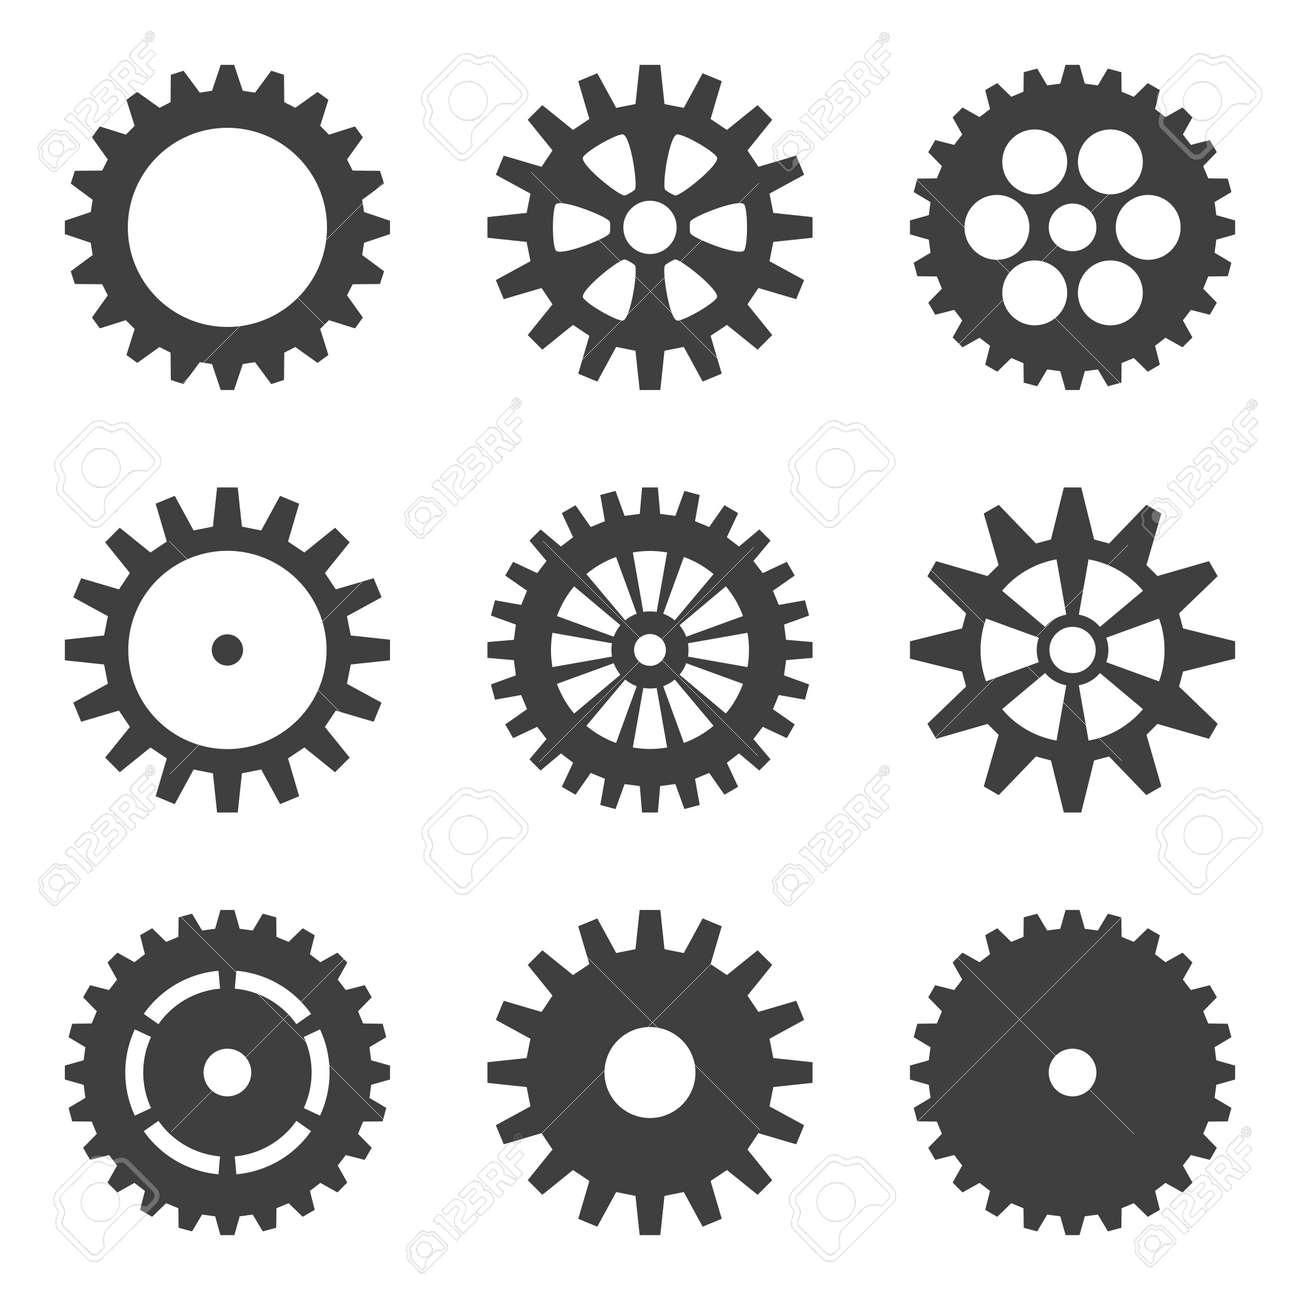 set of cogwheels icons. Flat design vector elements. - 125583875